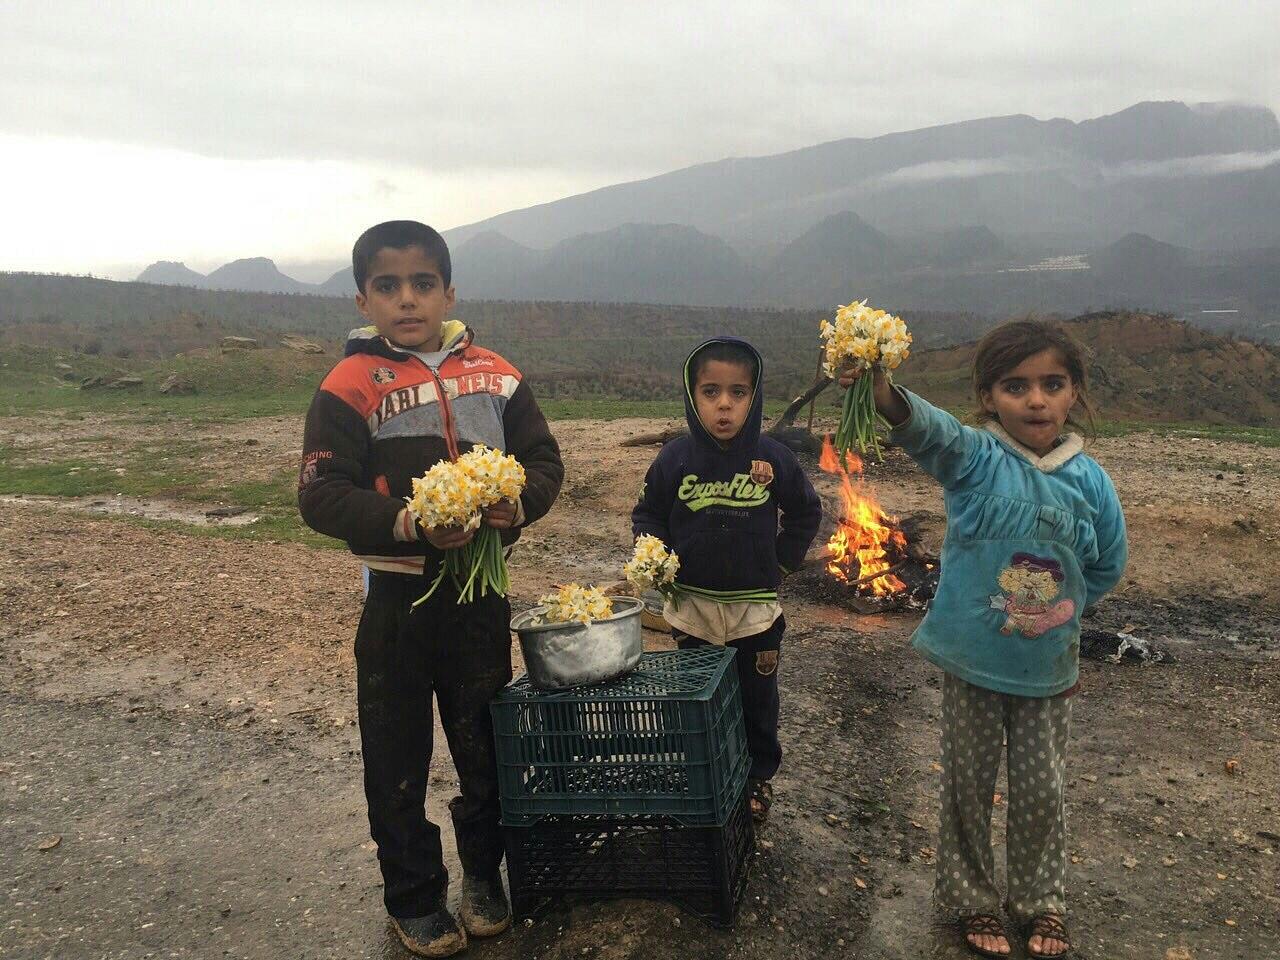 kurdsh children by Ako karim